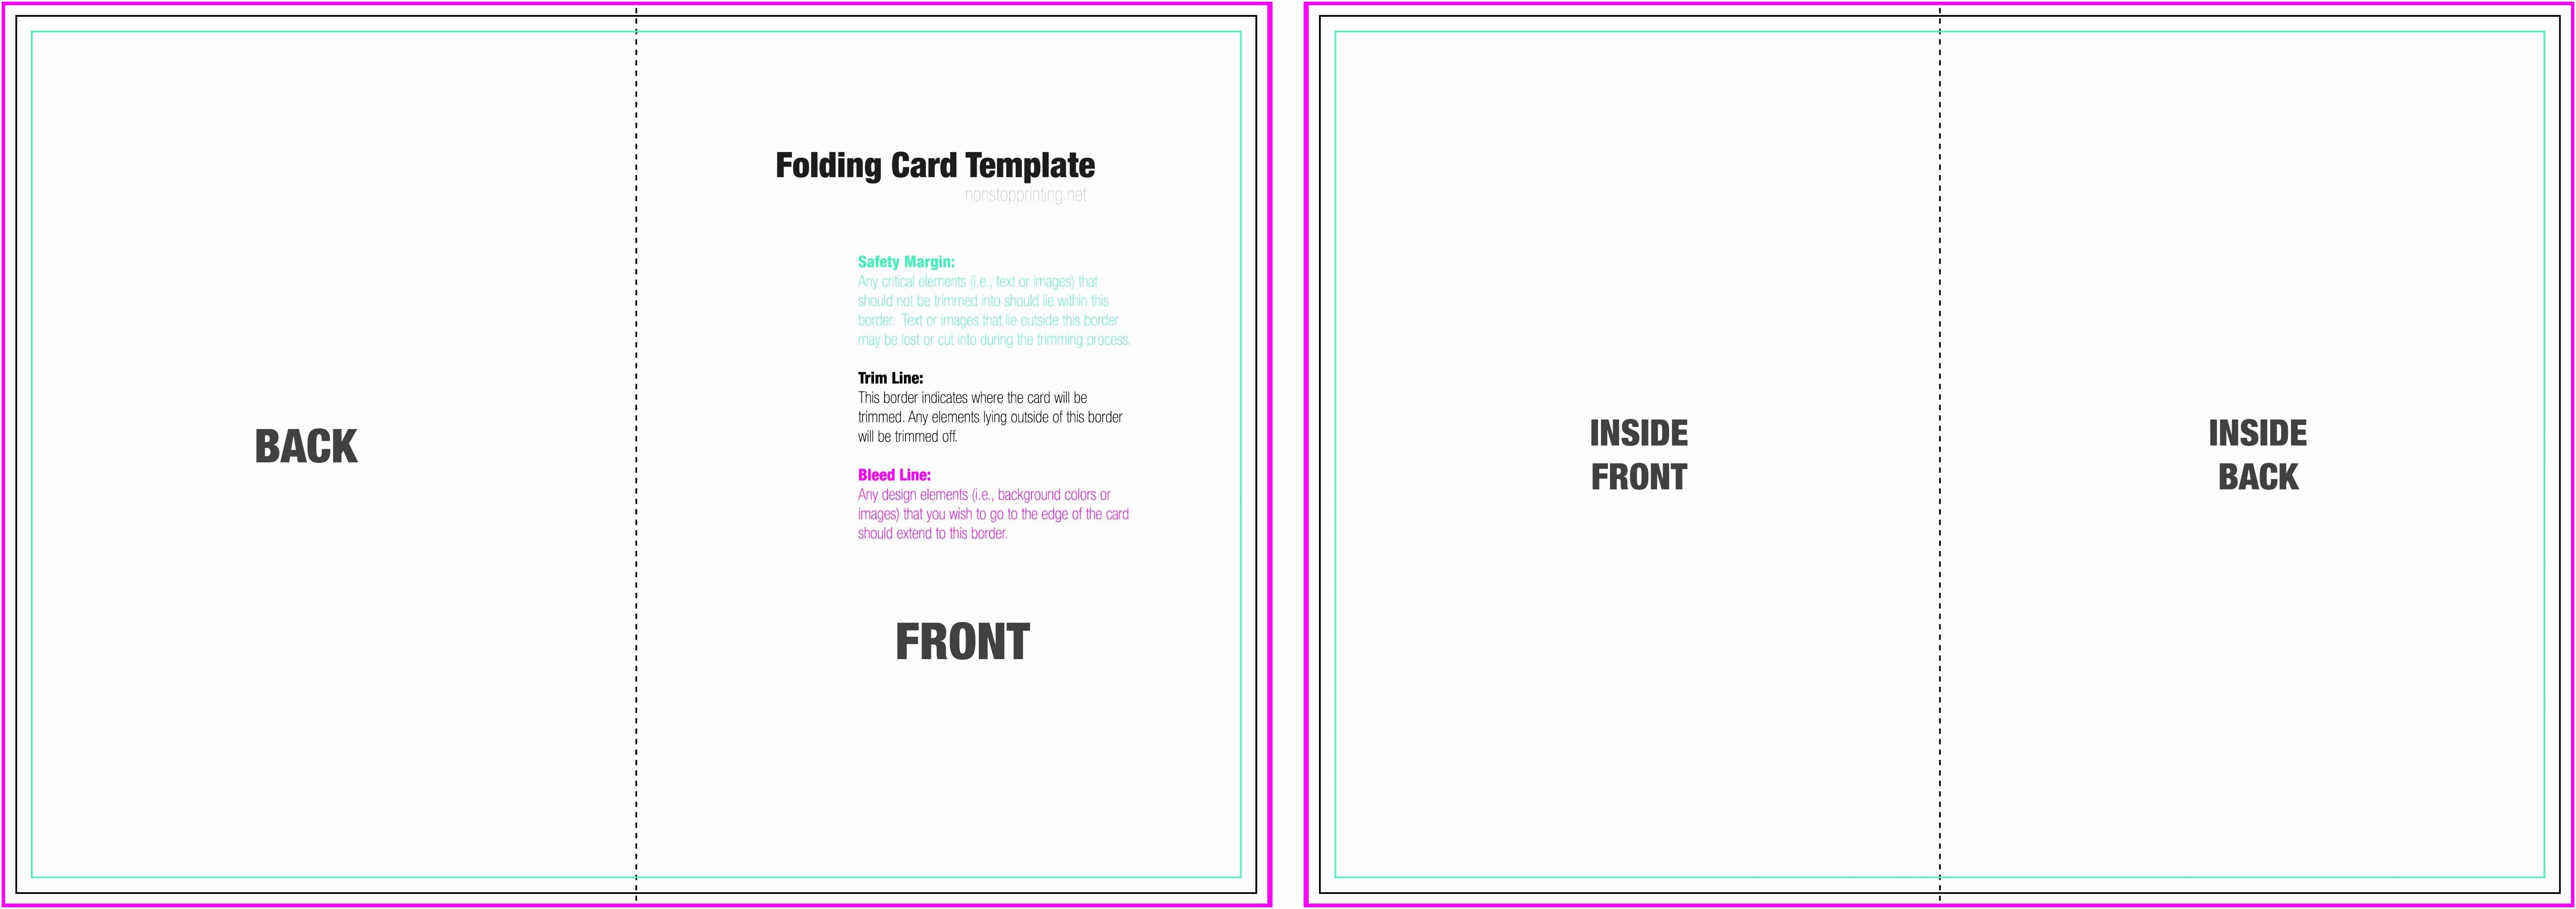 Half Fold Card Template Luxury  Blank Half Fold Card Template Intended For Half Fold Card Template